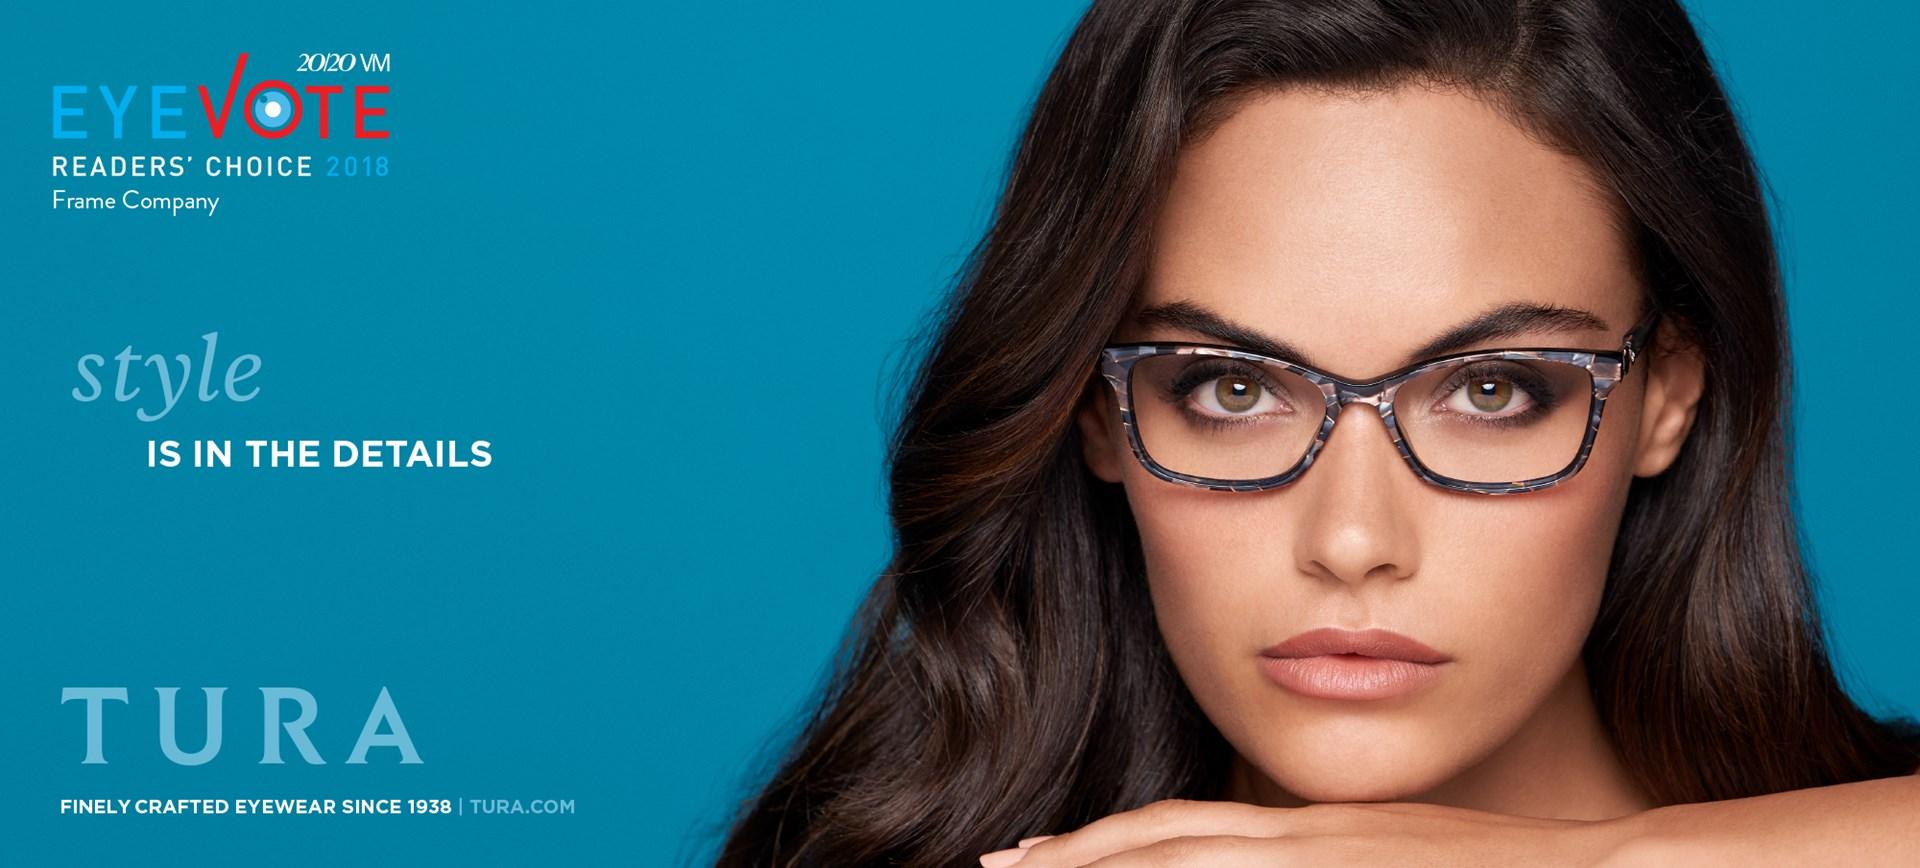 fbd69857a7 Welcome To The Tura Eyewear Brand Portfolio